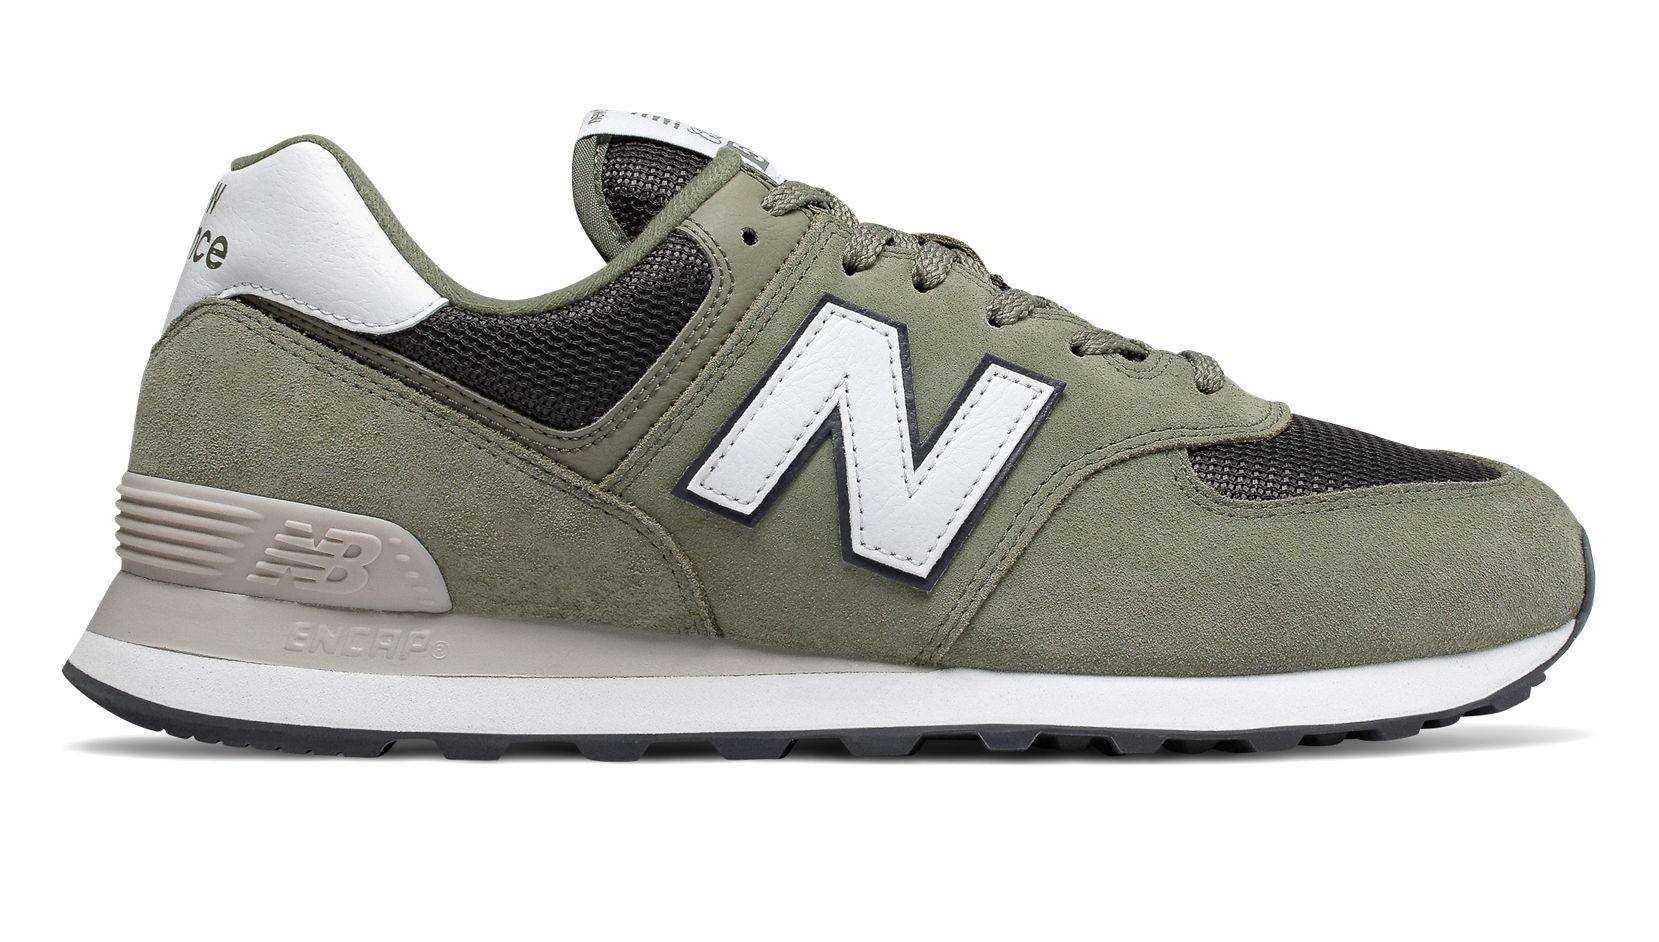 Sneakers Verde 574 Uomo Scarpe Nuova Balance New Camosciomesh Lc5R4Aj3q